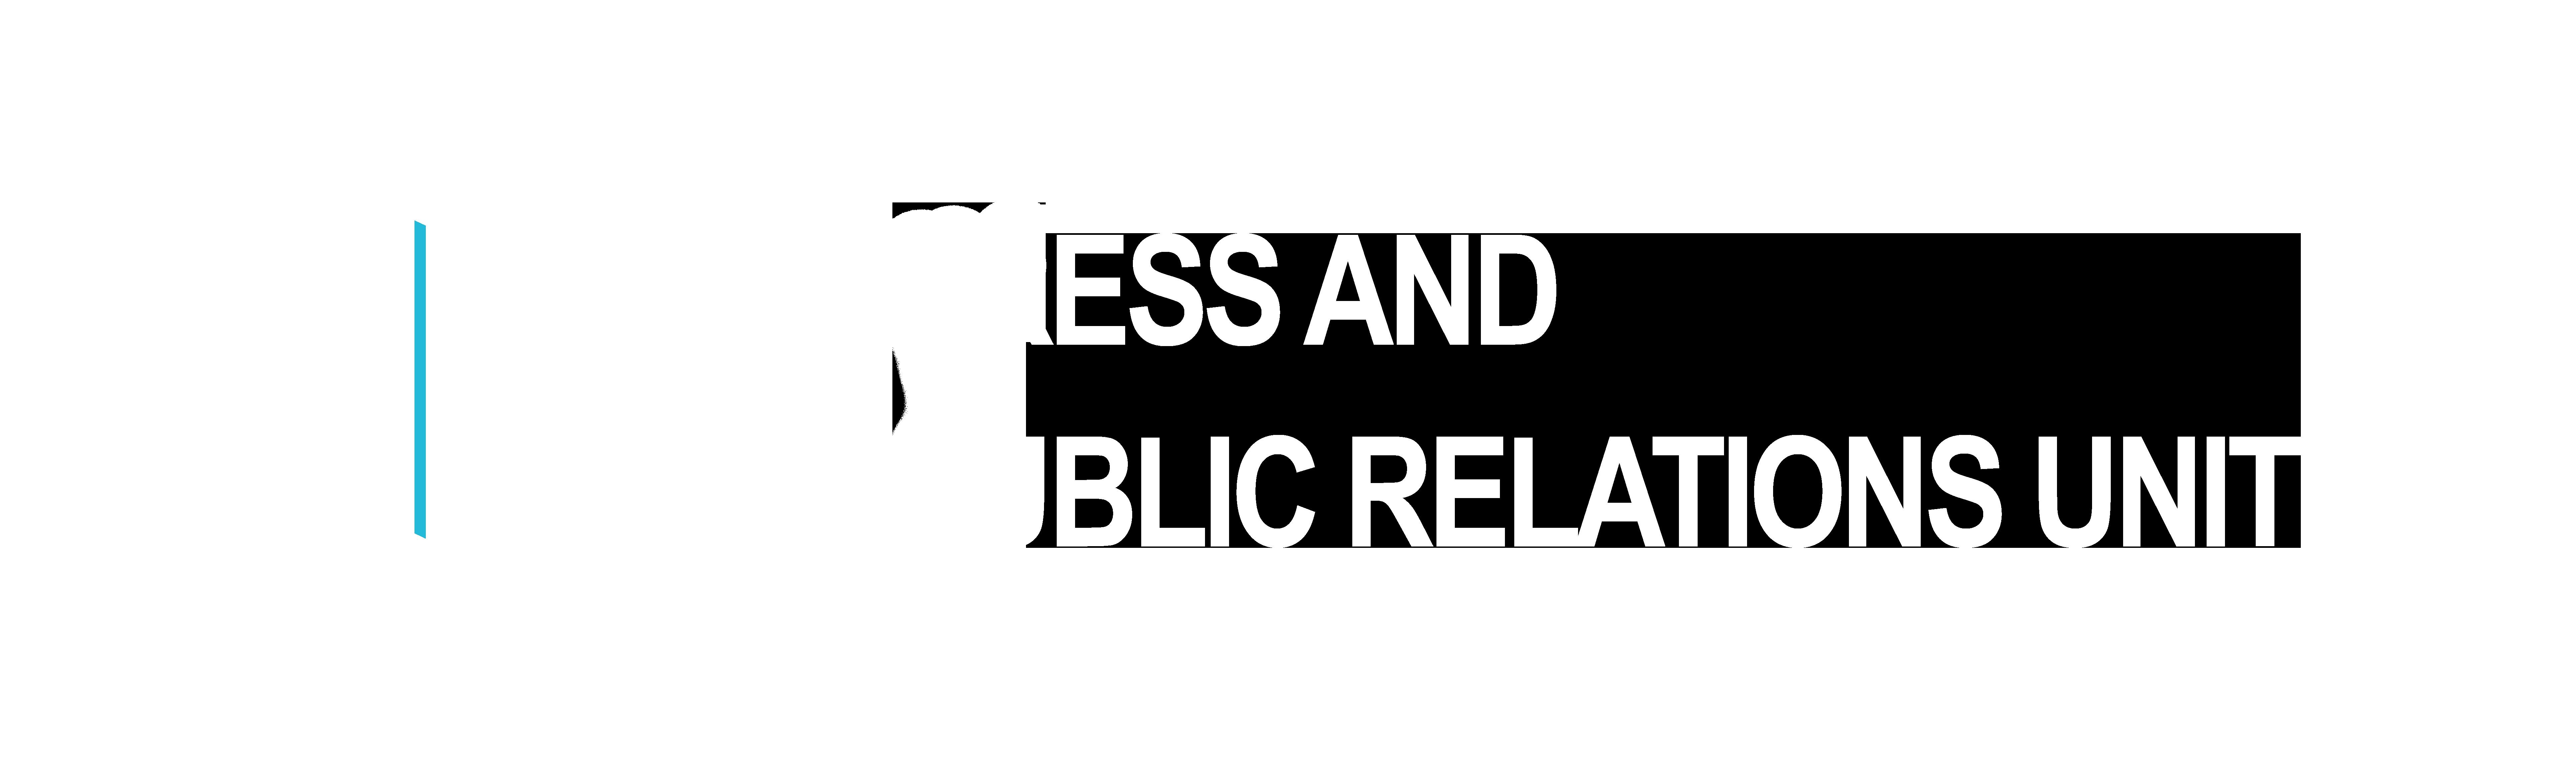 Press and Public Relations Unit